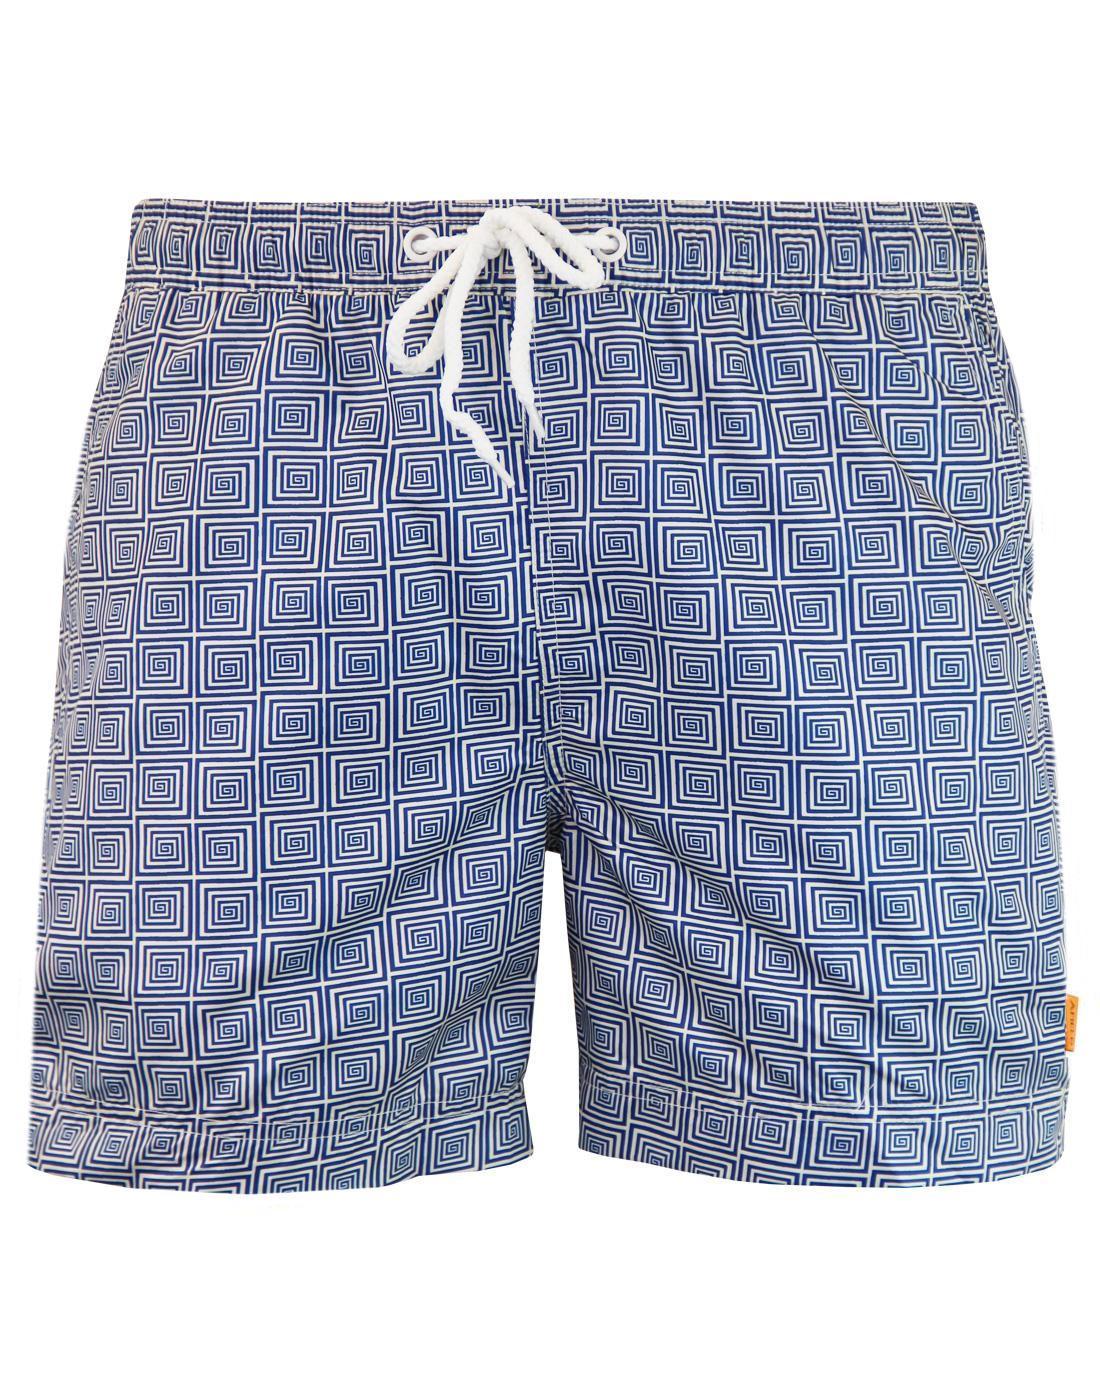 AFIELD Retro 70s Op Art Spiral Square Swim Shorts